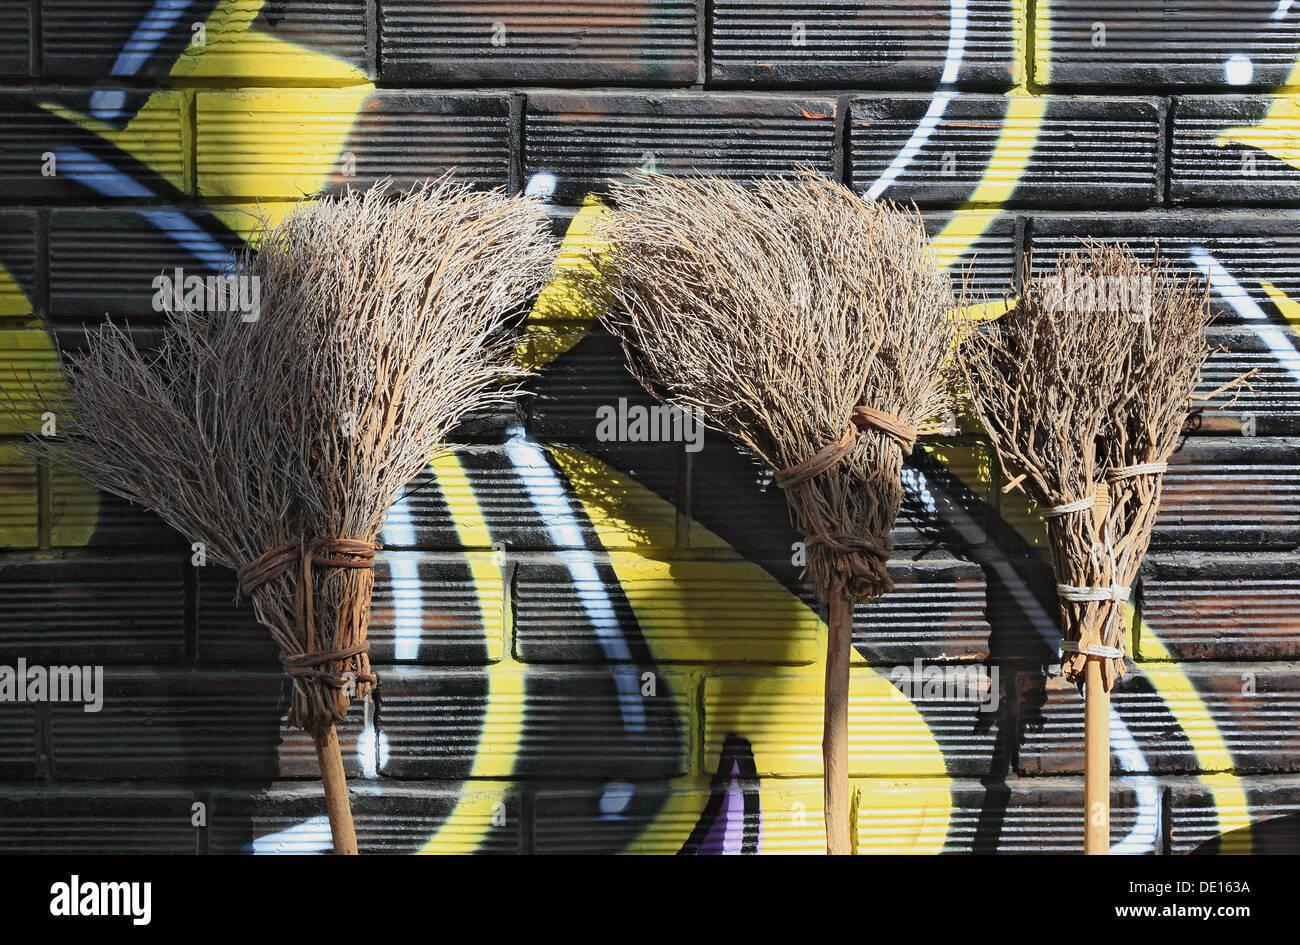 Three Broomsticks, handicrafts, straw broom, broom - Stock Image